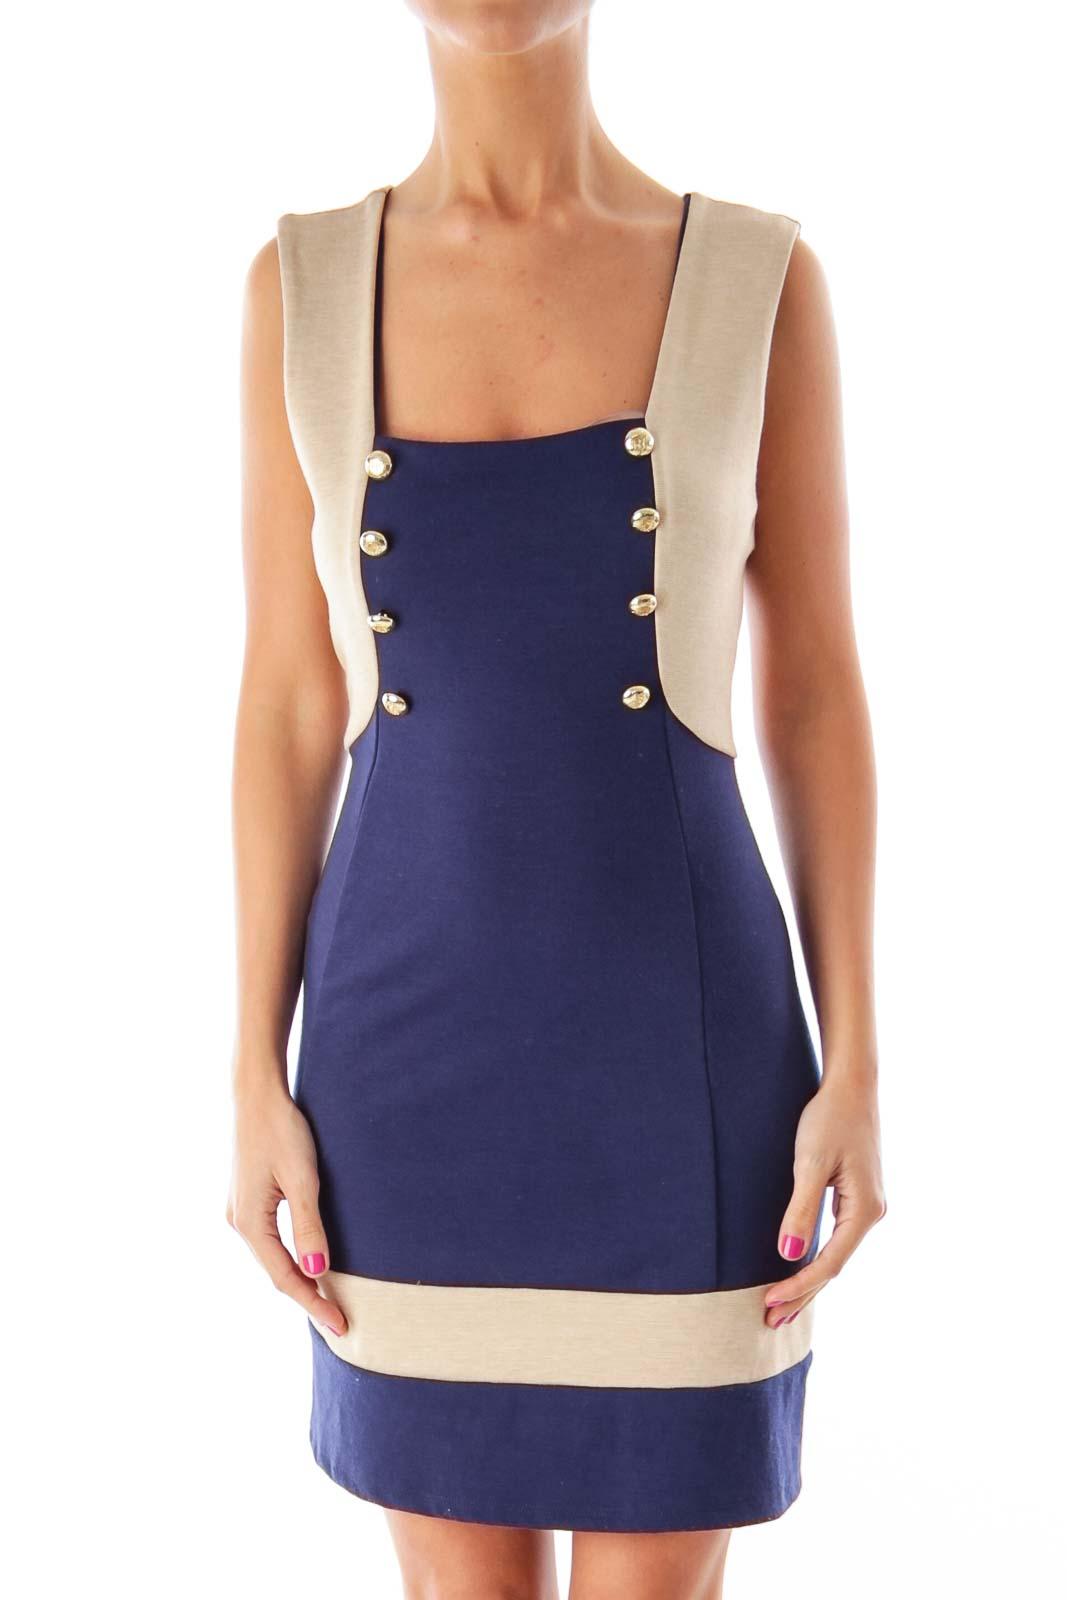 Navy & Beige Nautical Dress Front